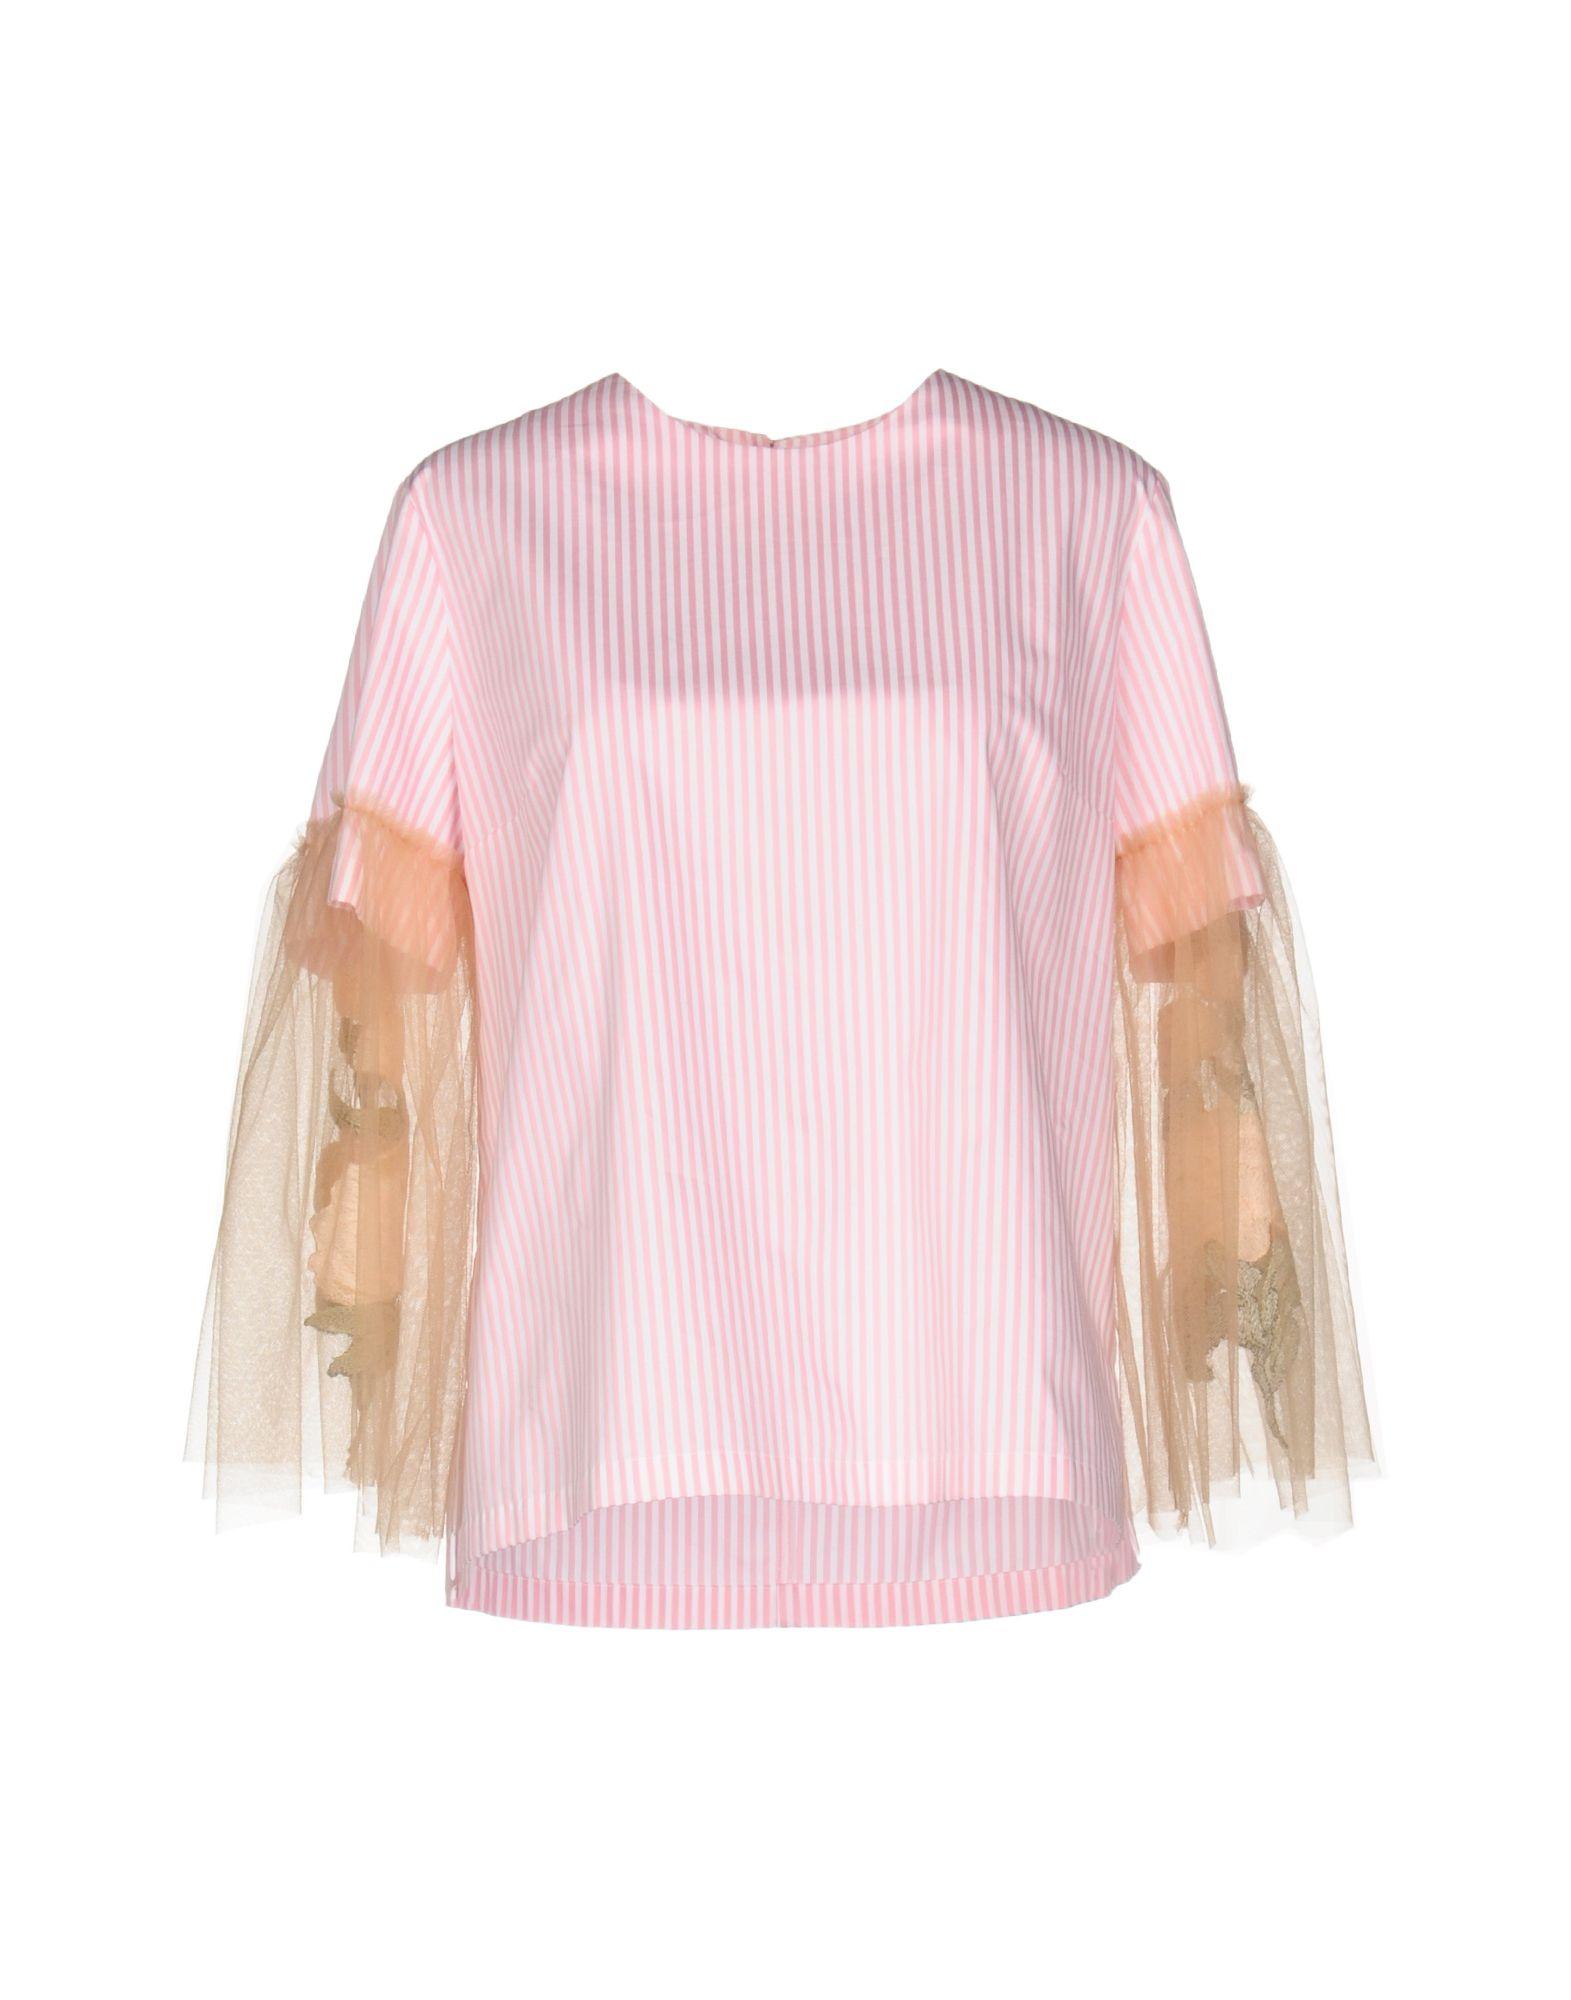 ELAIDI Blouse in Pink